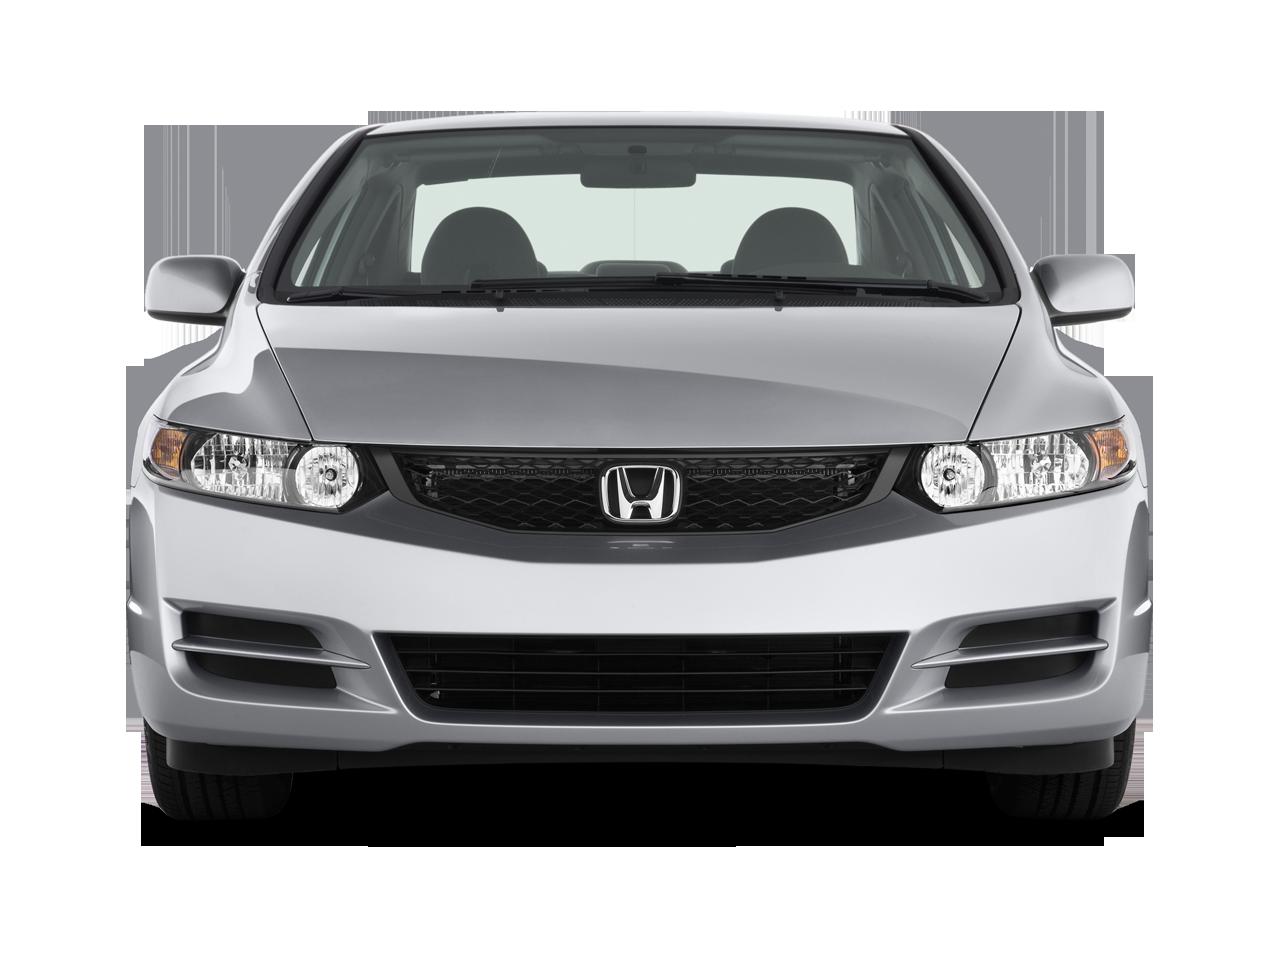 2009 Honda Civic Si Coupe Honda Sport Coupe Review